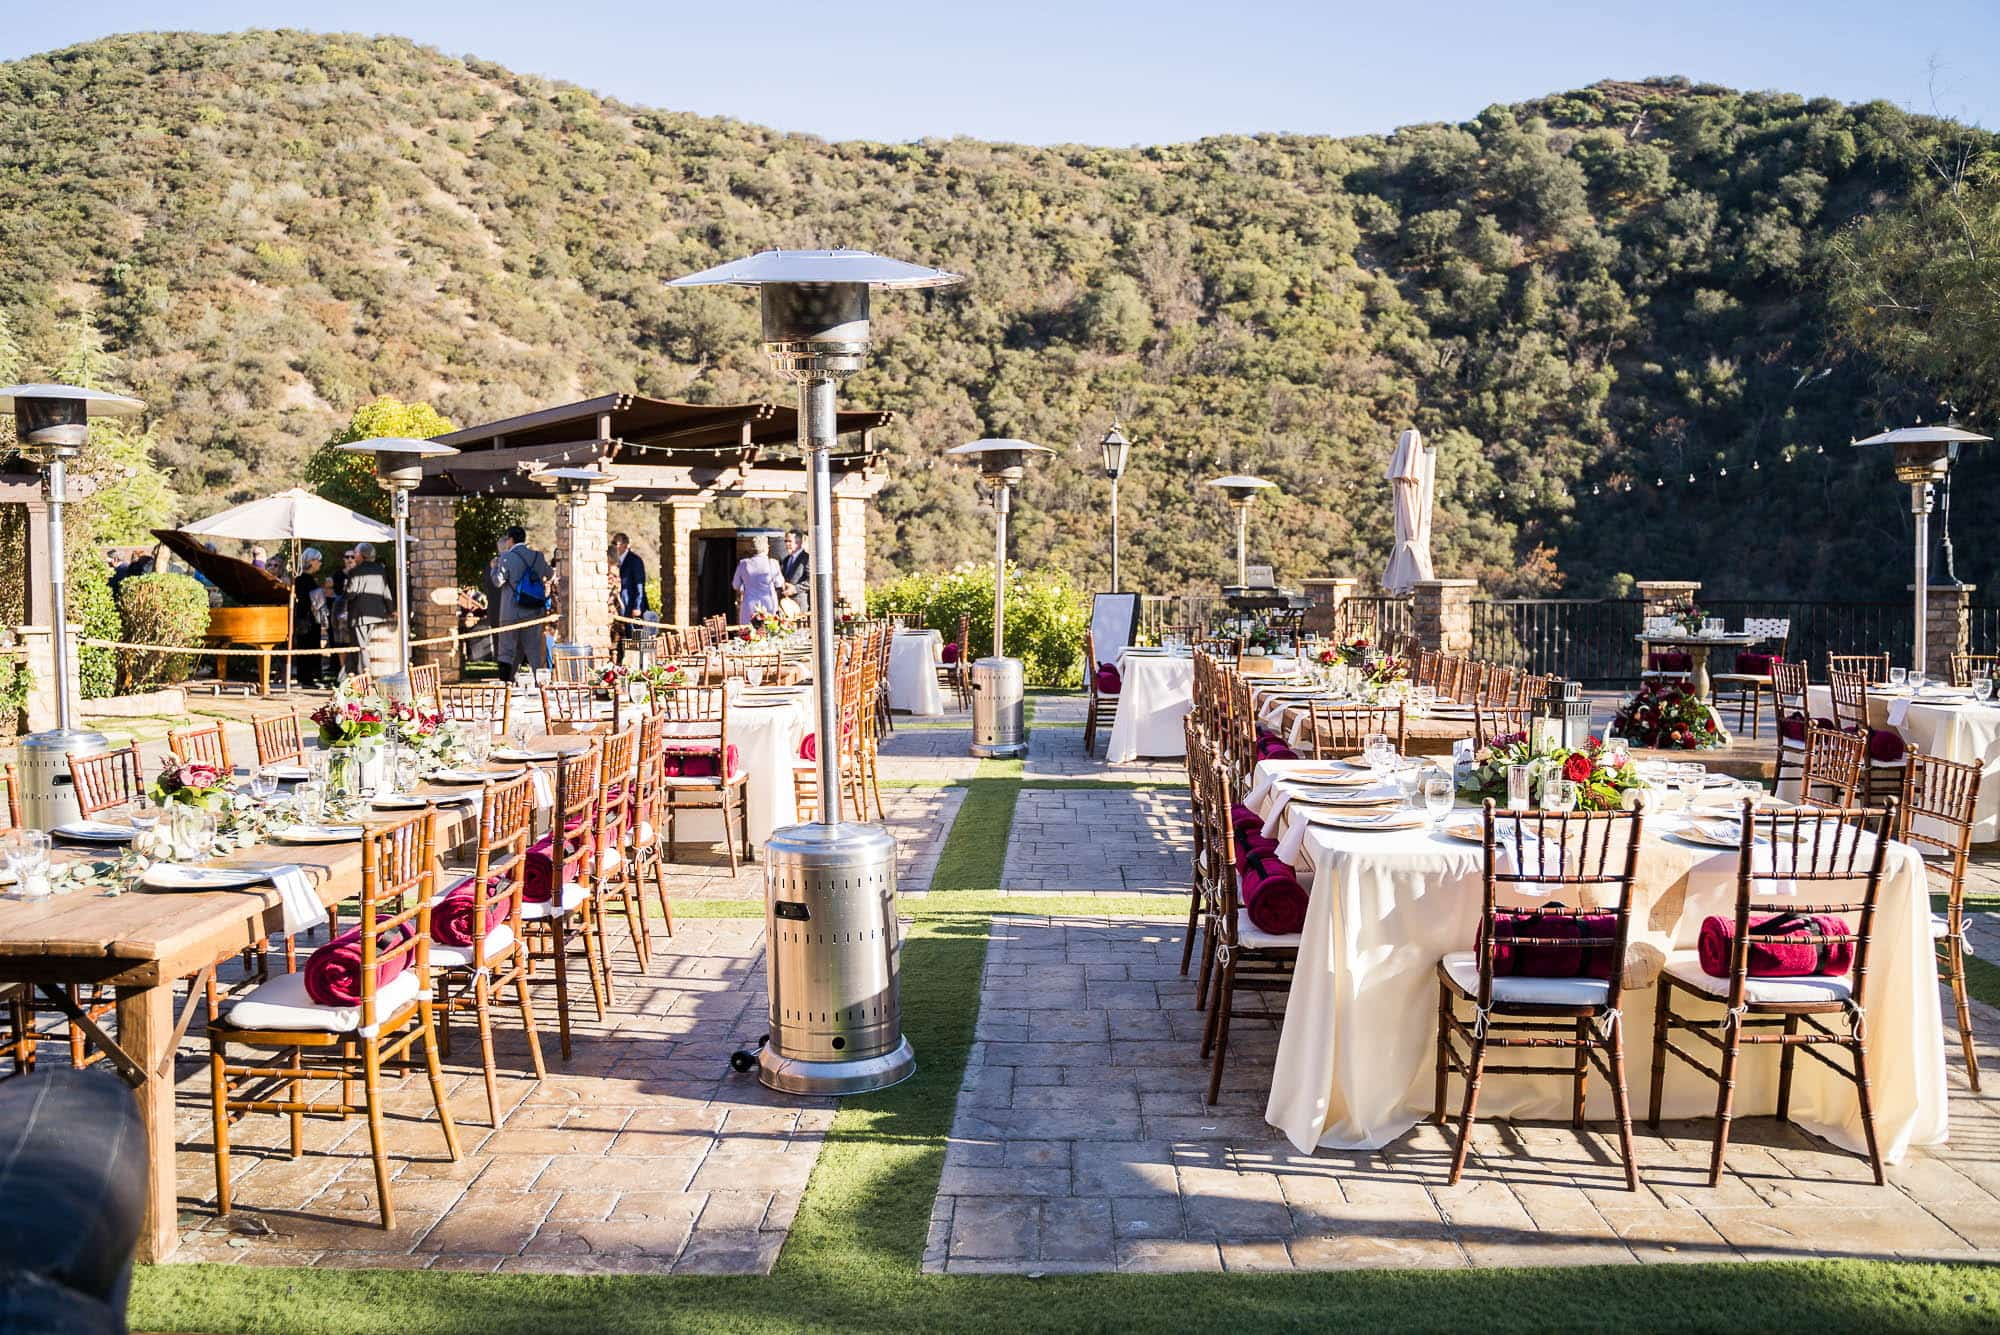 457_Alan_and_Heidi_Serendipity_Garden_Wedding_10-27-2018